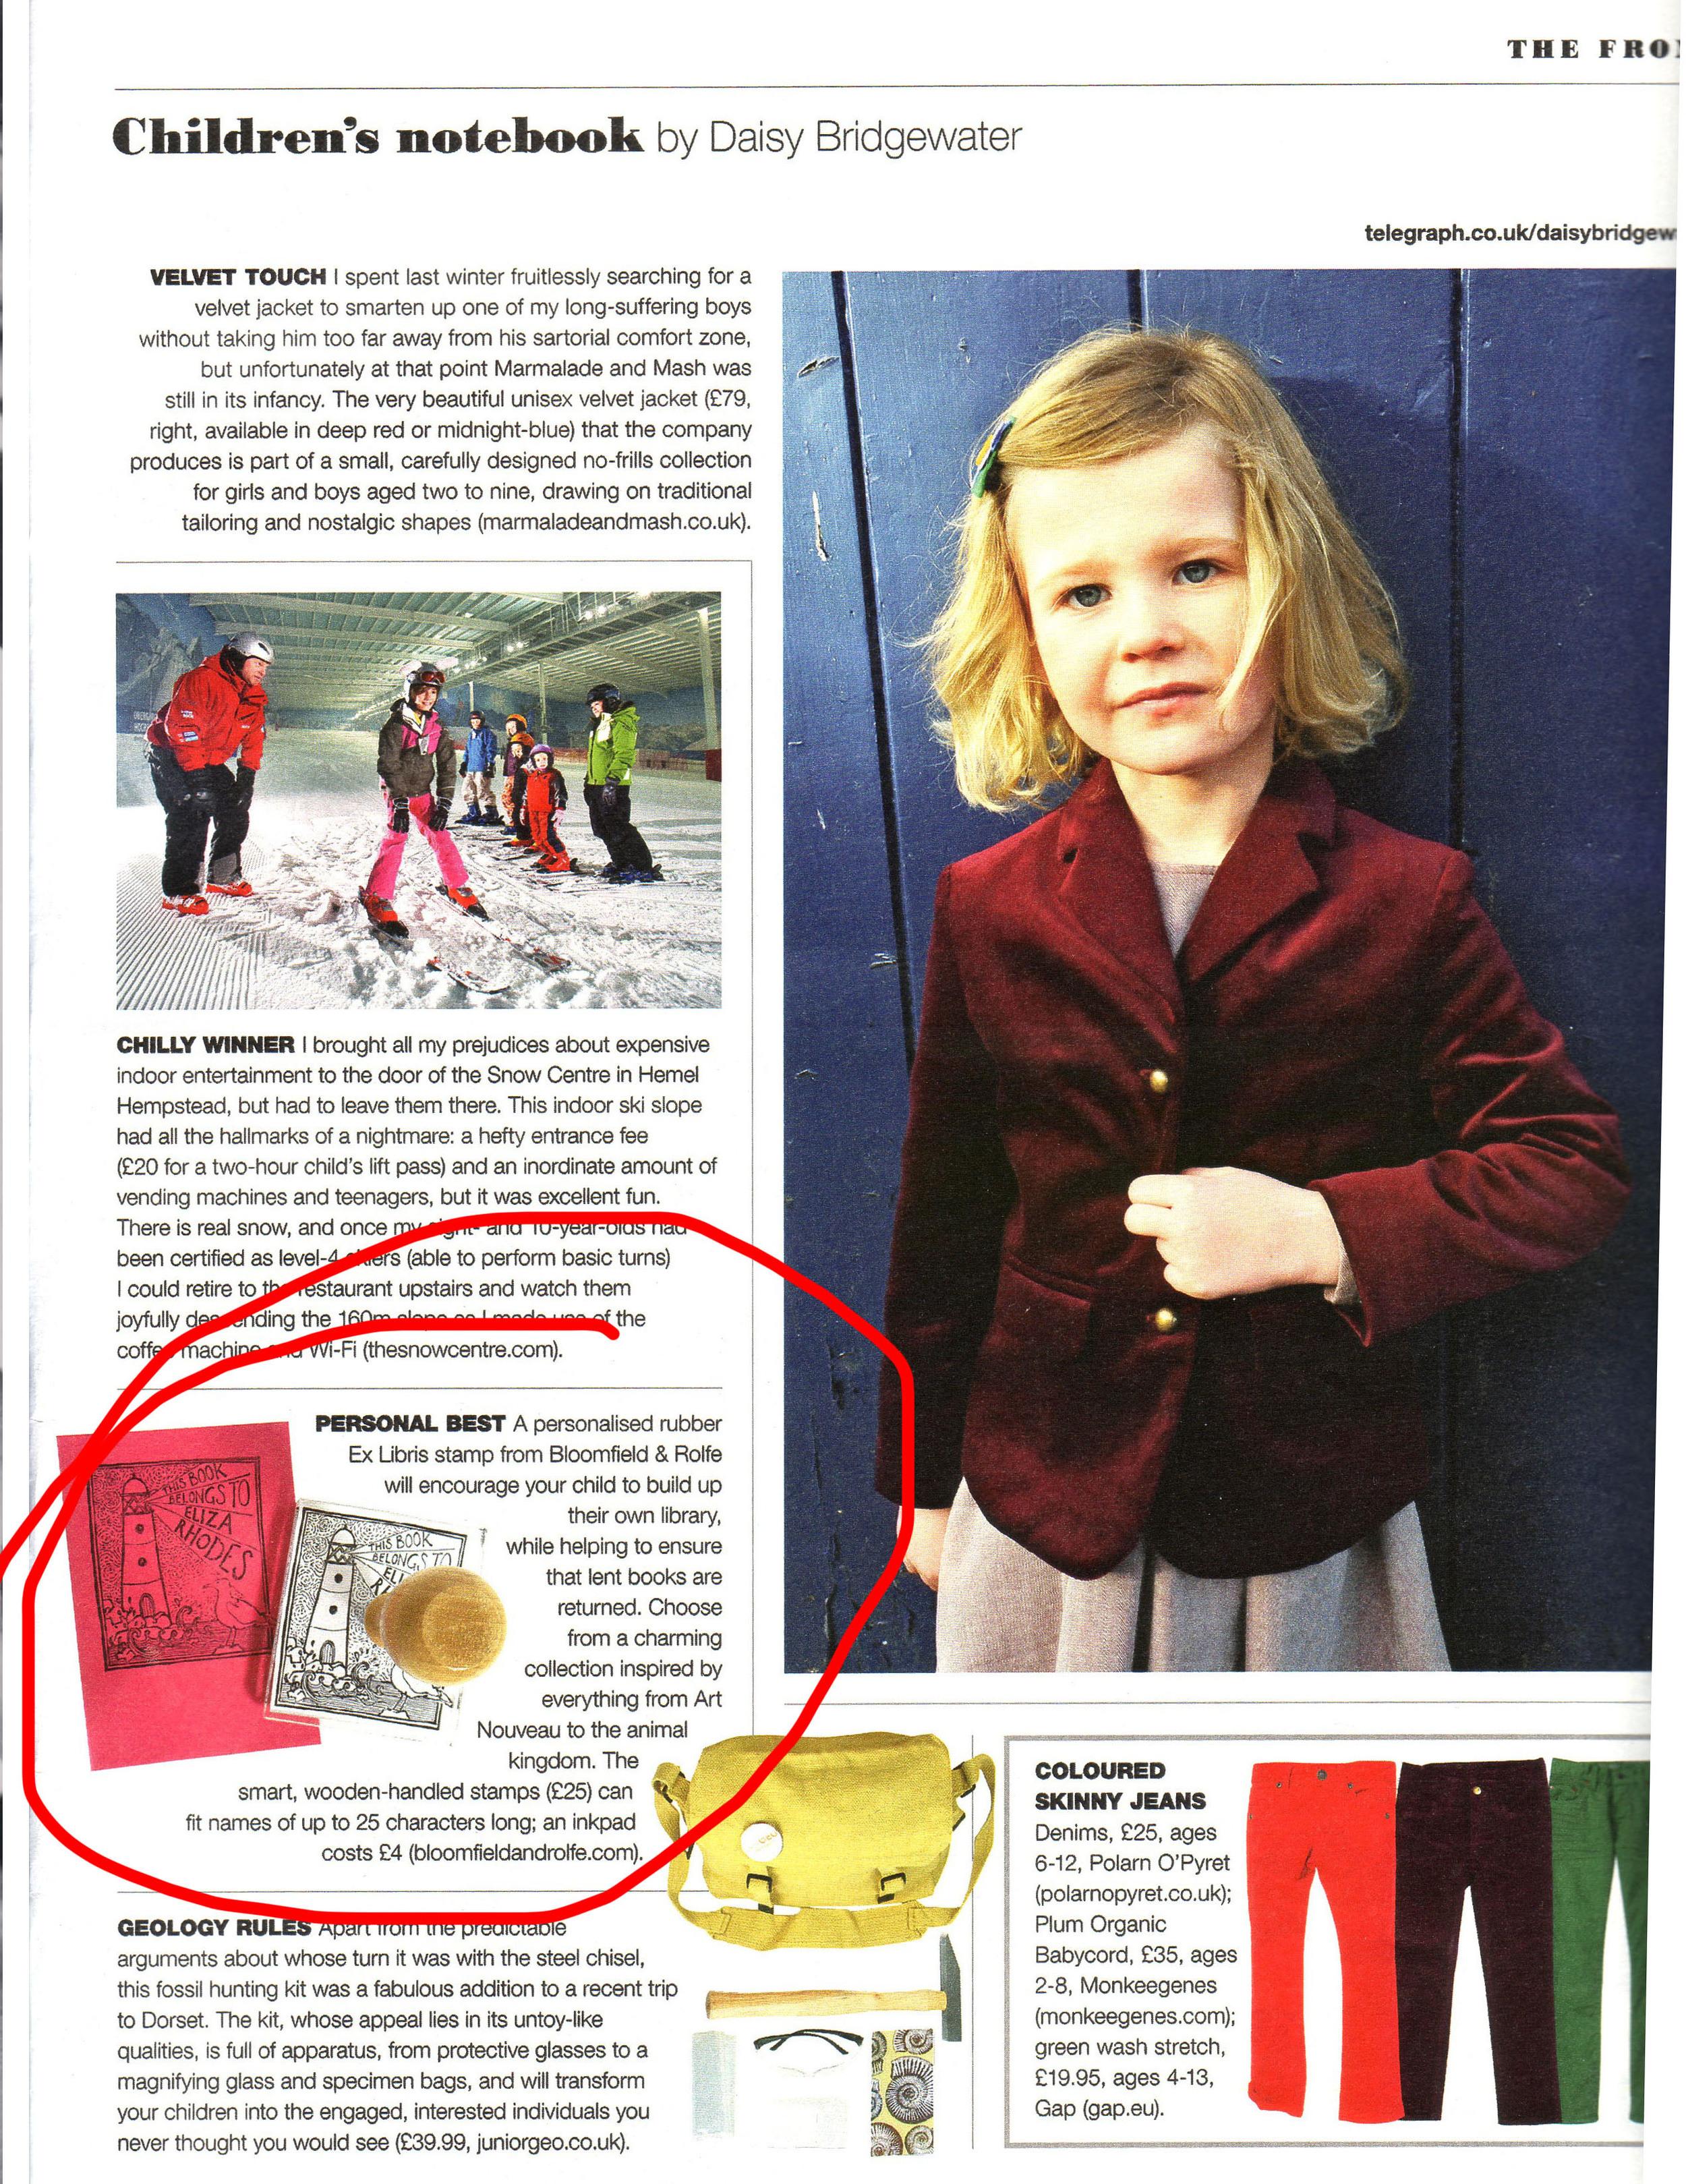 Telegraph Magazine - 13/10/12